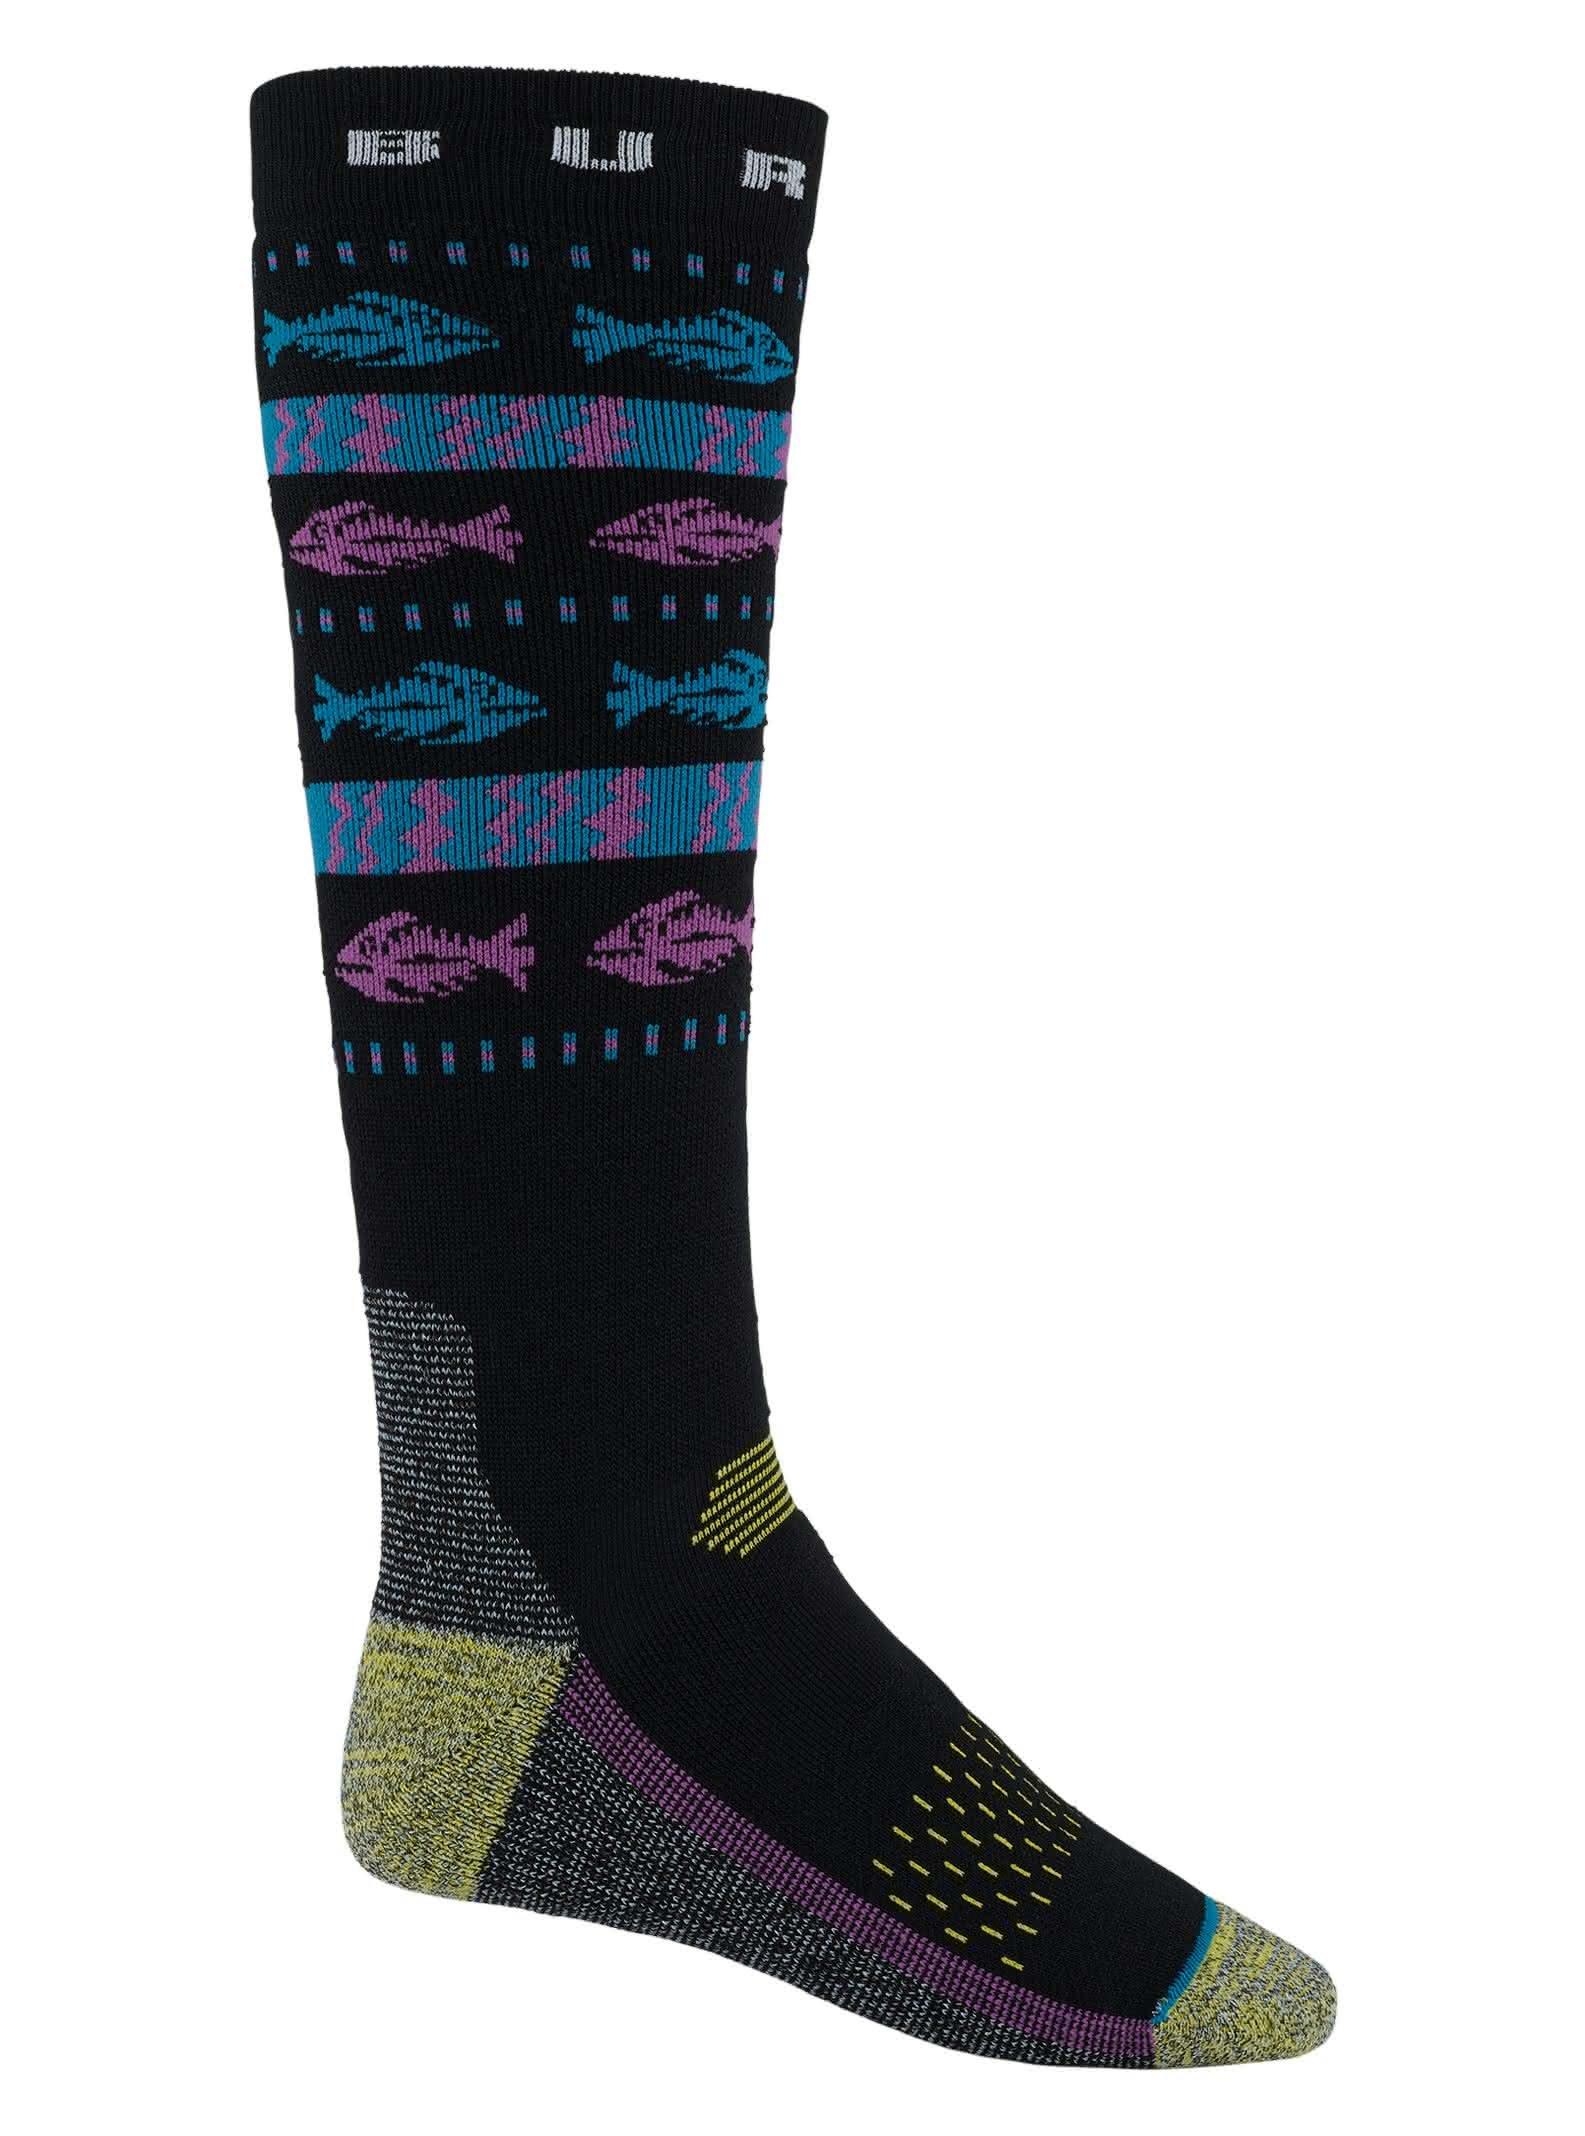 Skarpety Snowboardowe Burton Performance Midweight Retro Sock (1992) W19